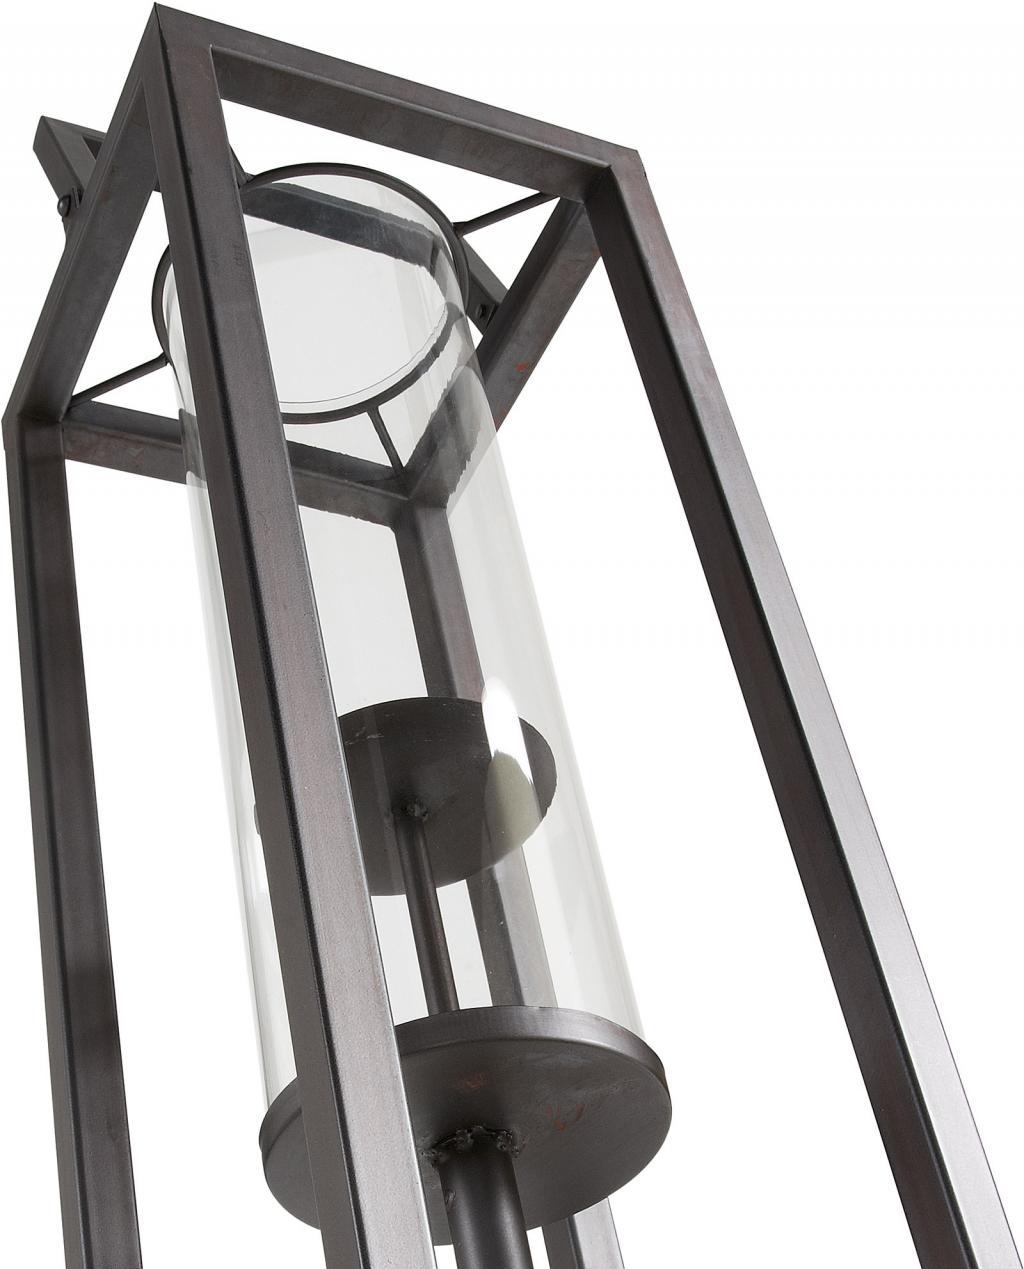 kerzenst nder coastal h 114cm metall schwarz la forma kaufen wohn. Black Bedroom Furniture Sets. Home Design Ideas